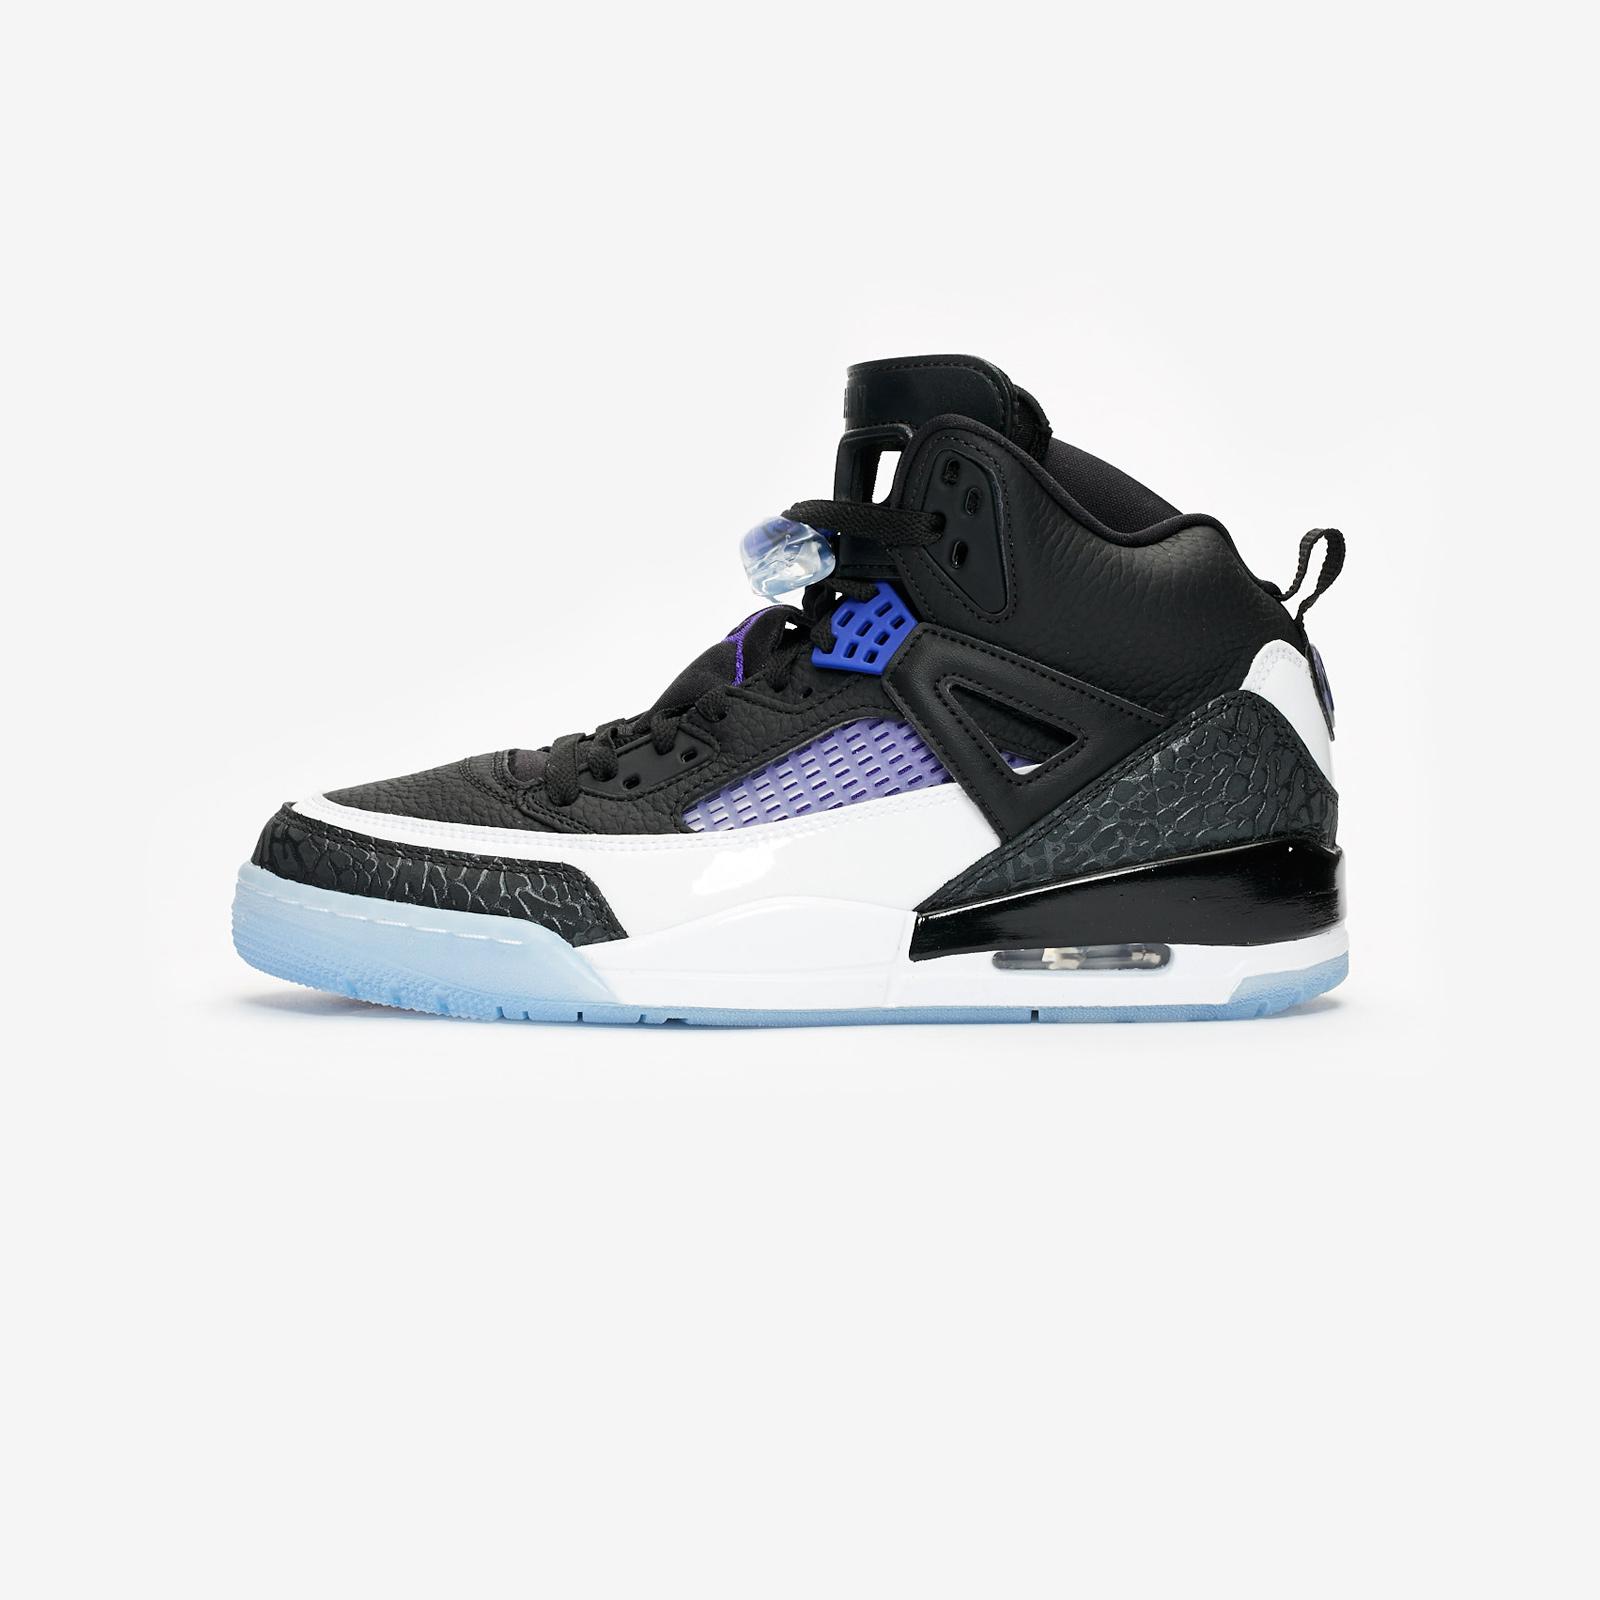 a58680e203a2 Jordan Brand Jordan Spizike - 315371-005 - Sneakersnstuff